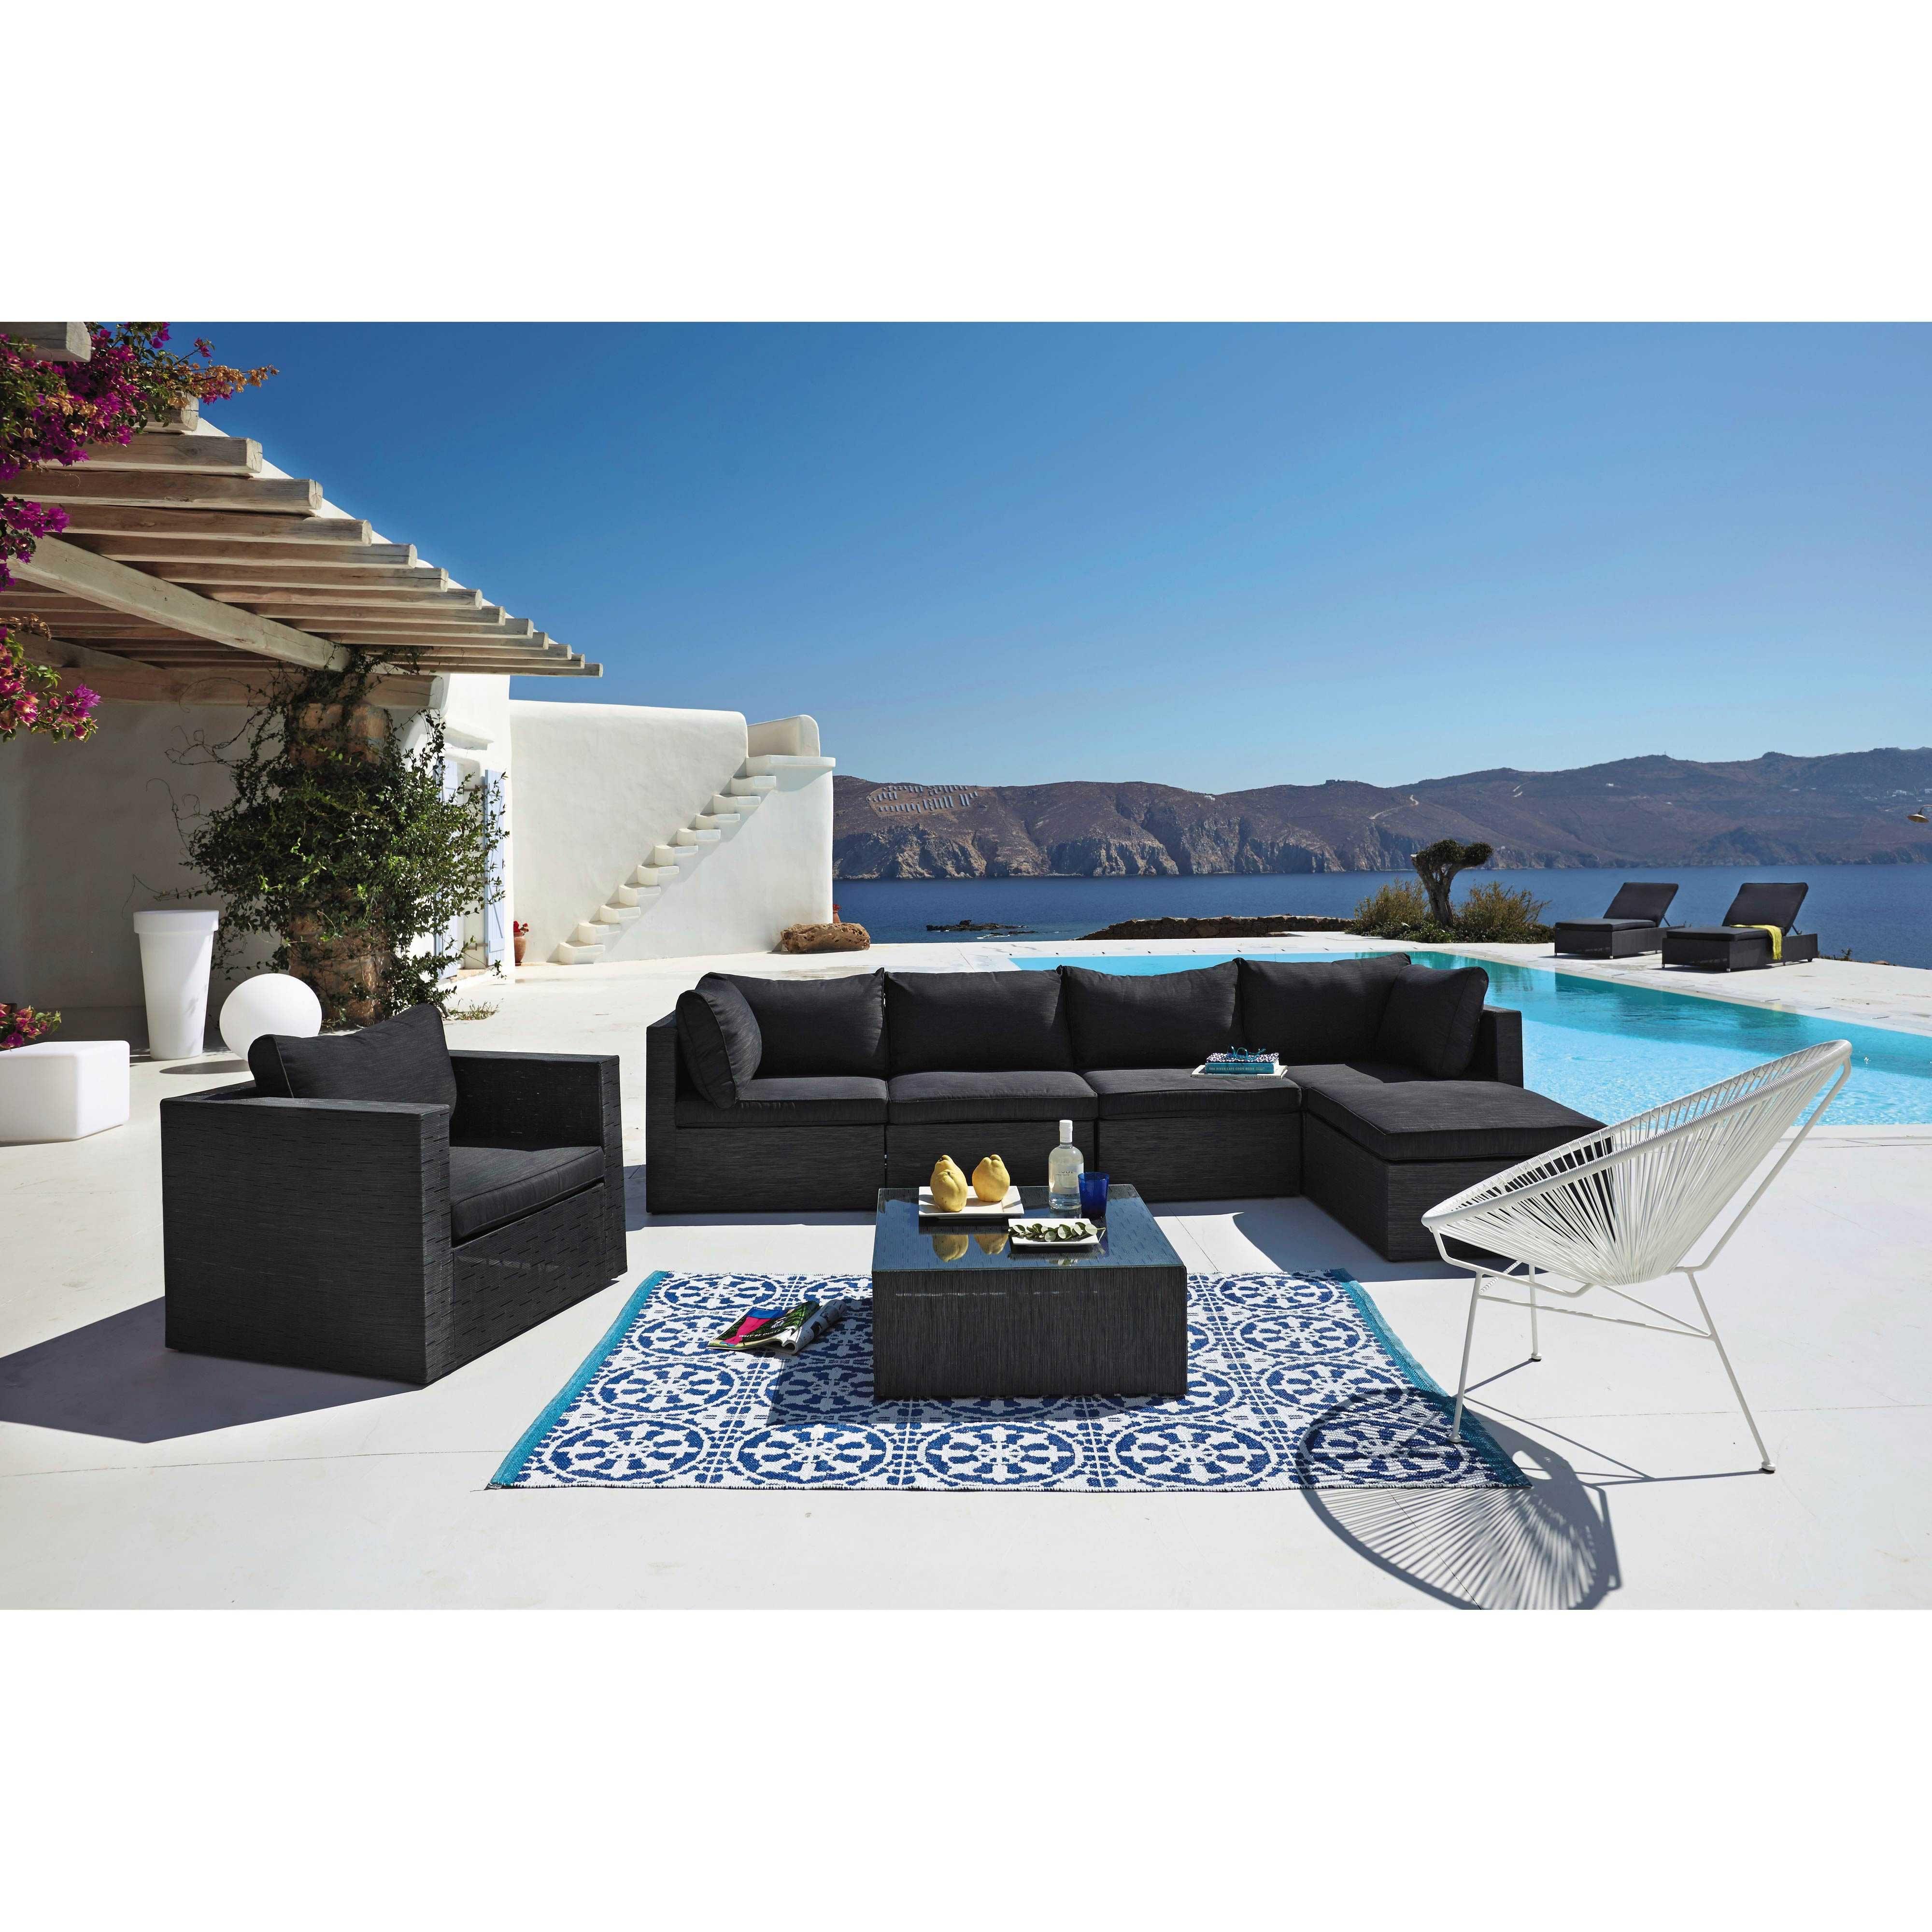 tappeto da giardino salon de jardin design tapis jardin meuble exterieur